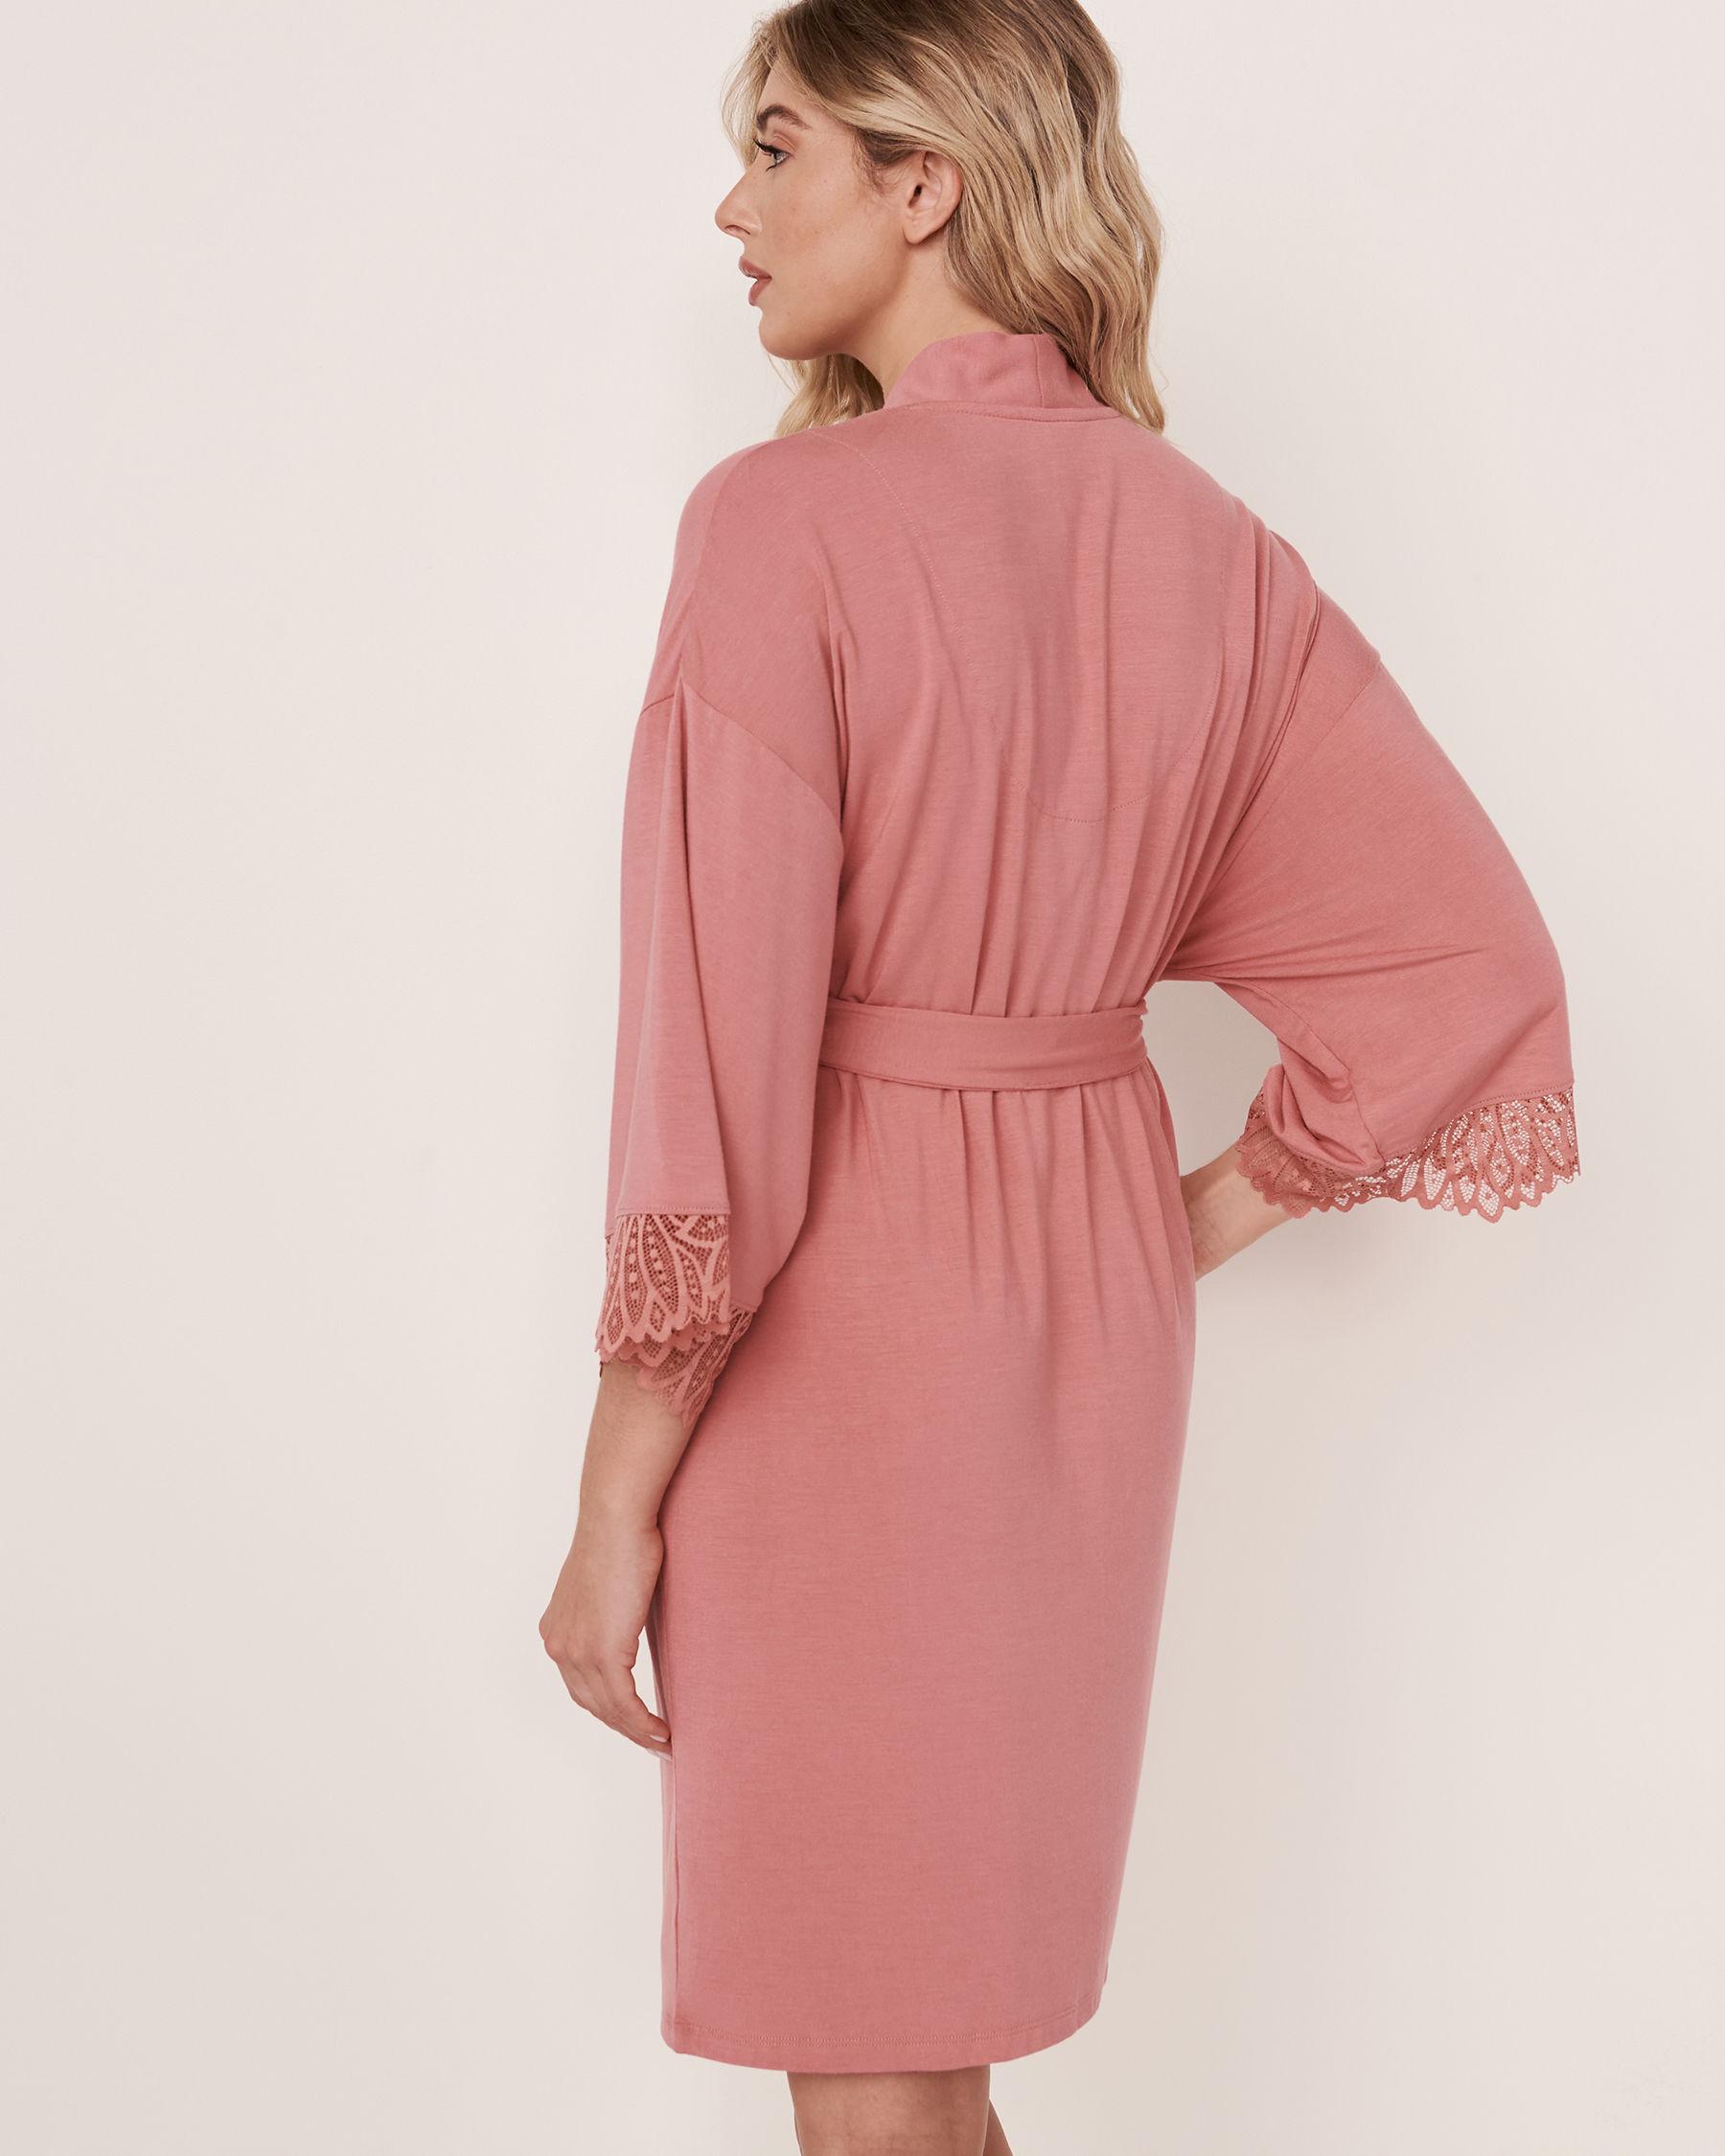 LA VIE EN ROSE Kimono garniture de dentelle en modal Vieux rose 40600020 - Voir3